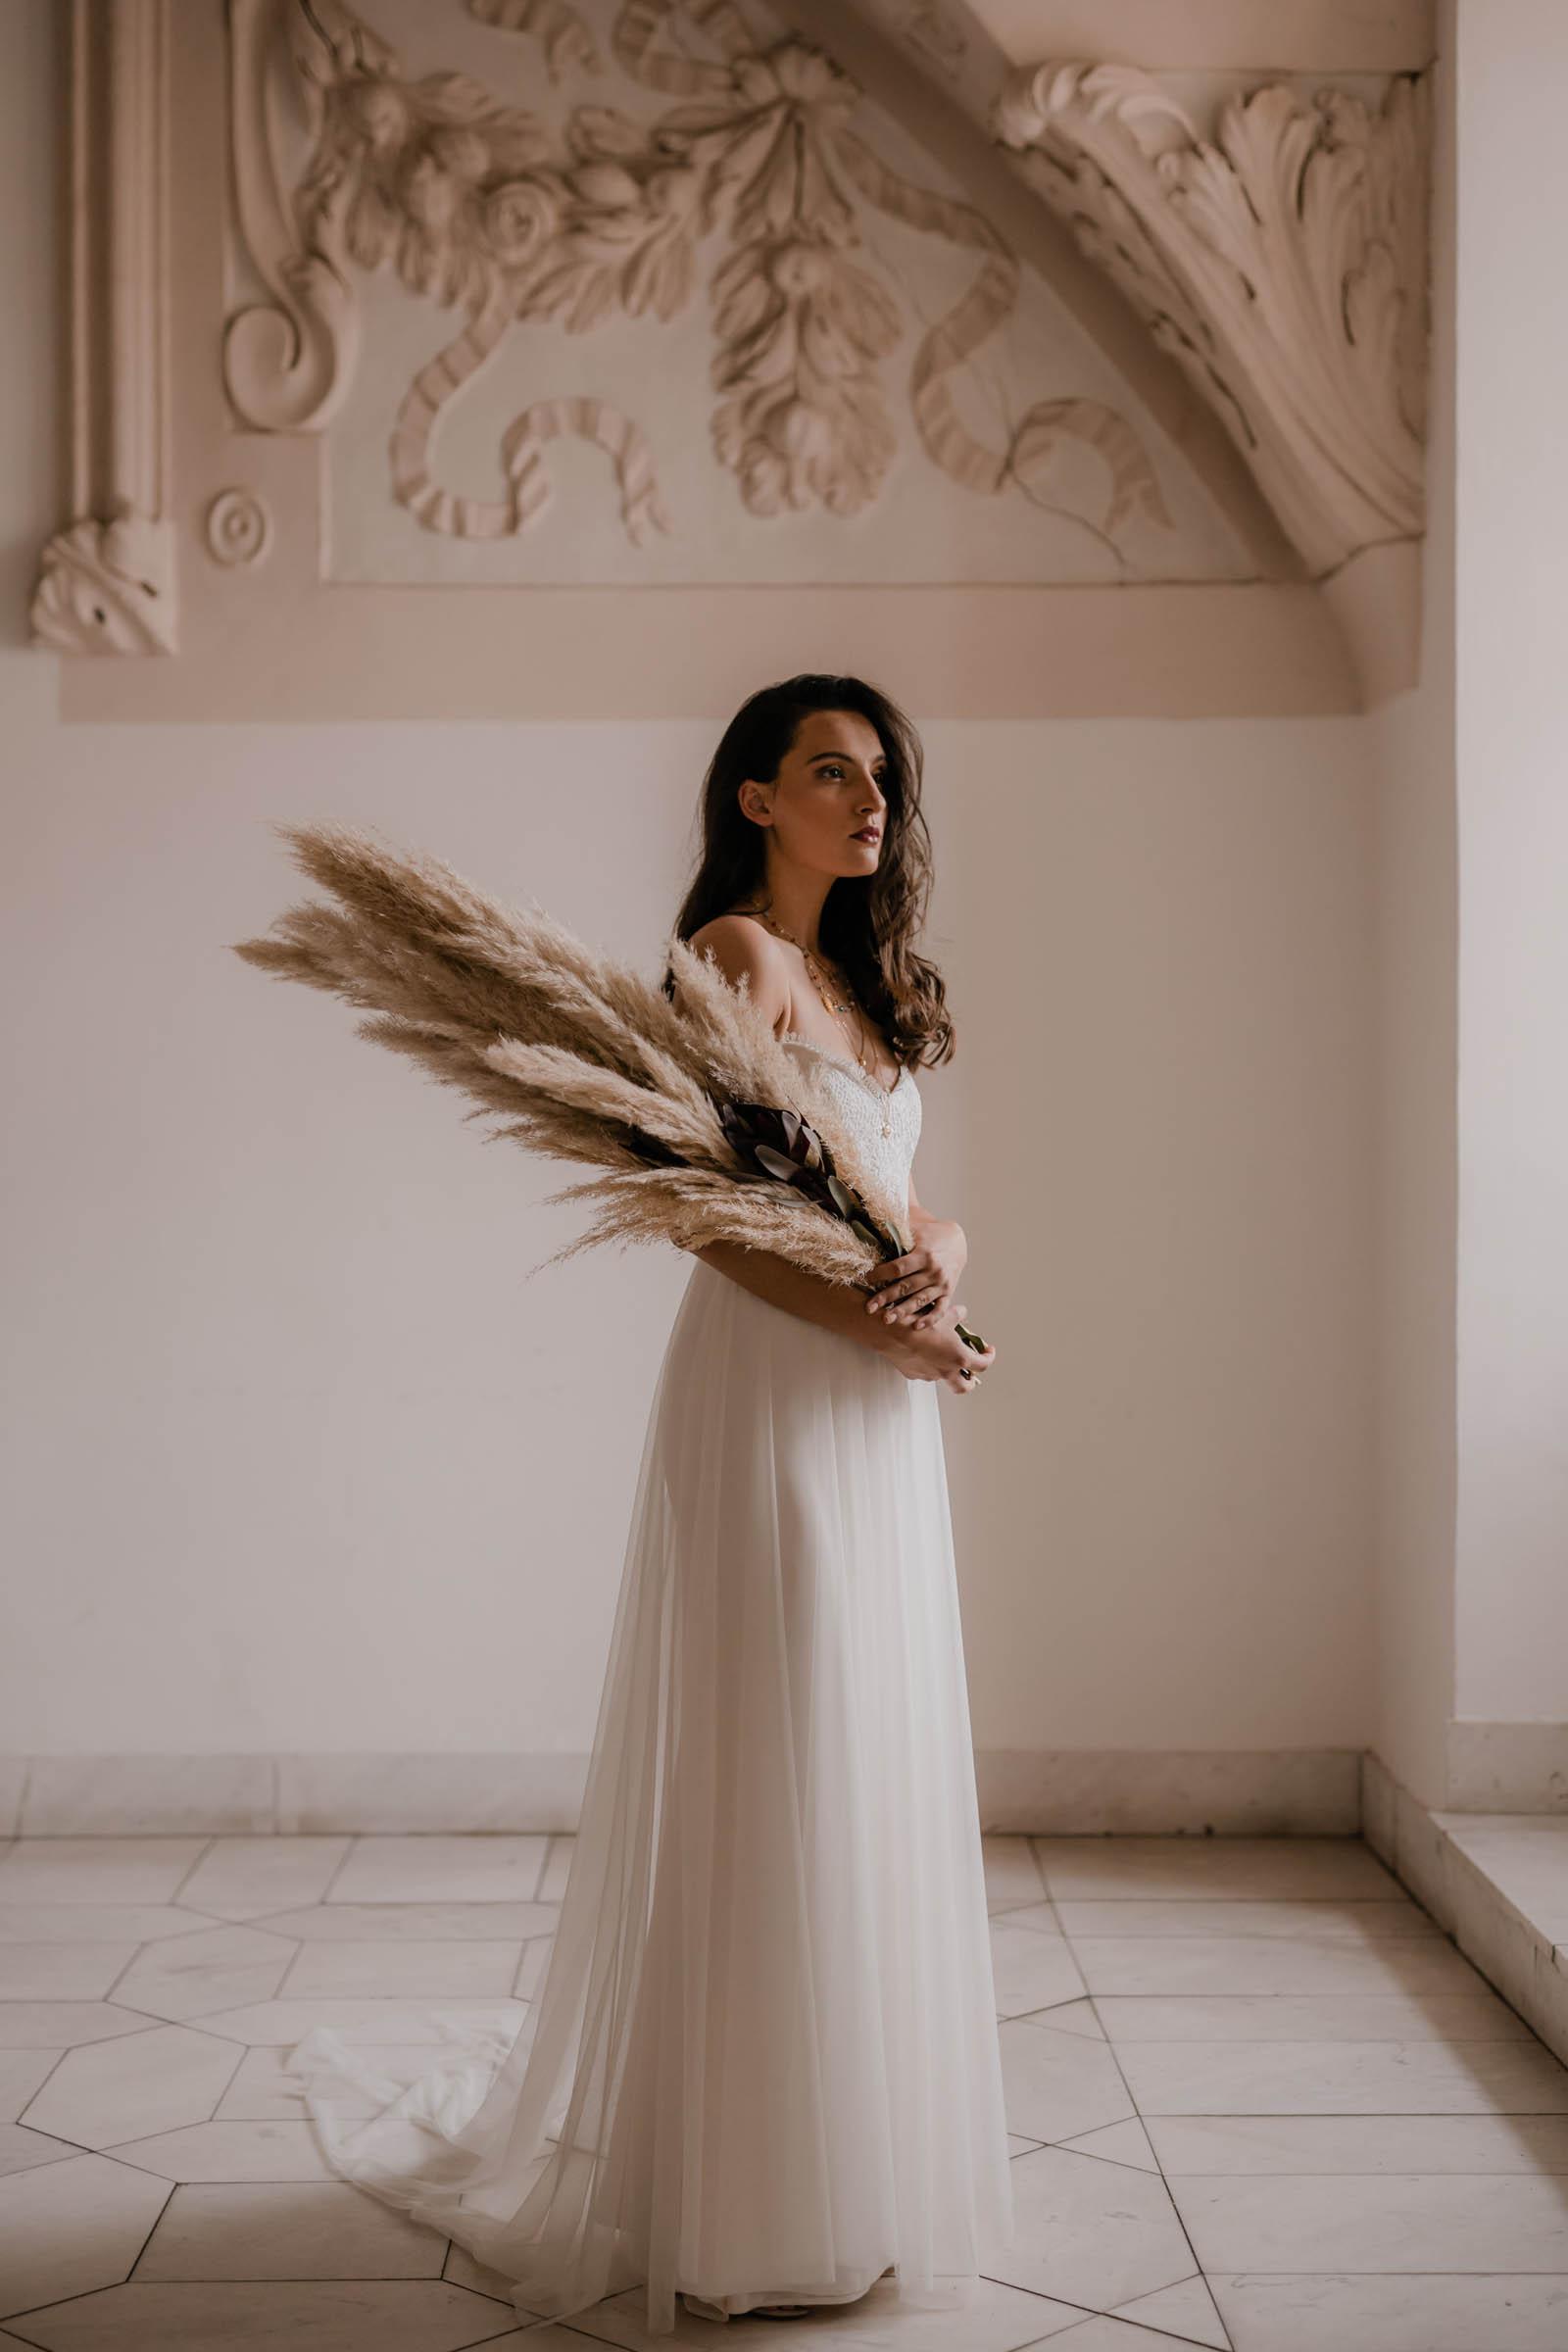 boho-svadobne-saty-veronika-kostkova-wedding-atelier-2019-tavia-II-3